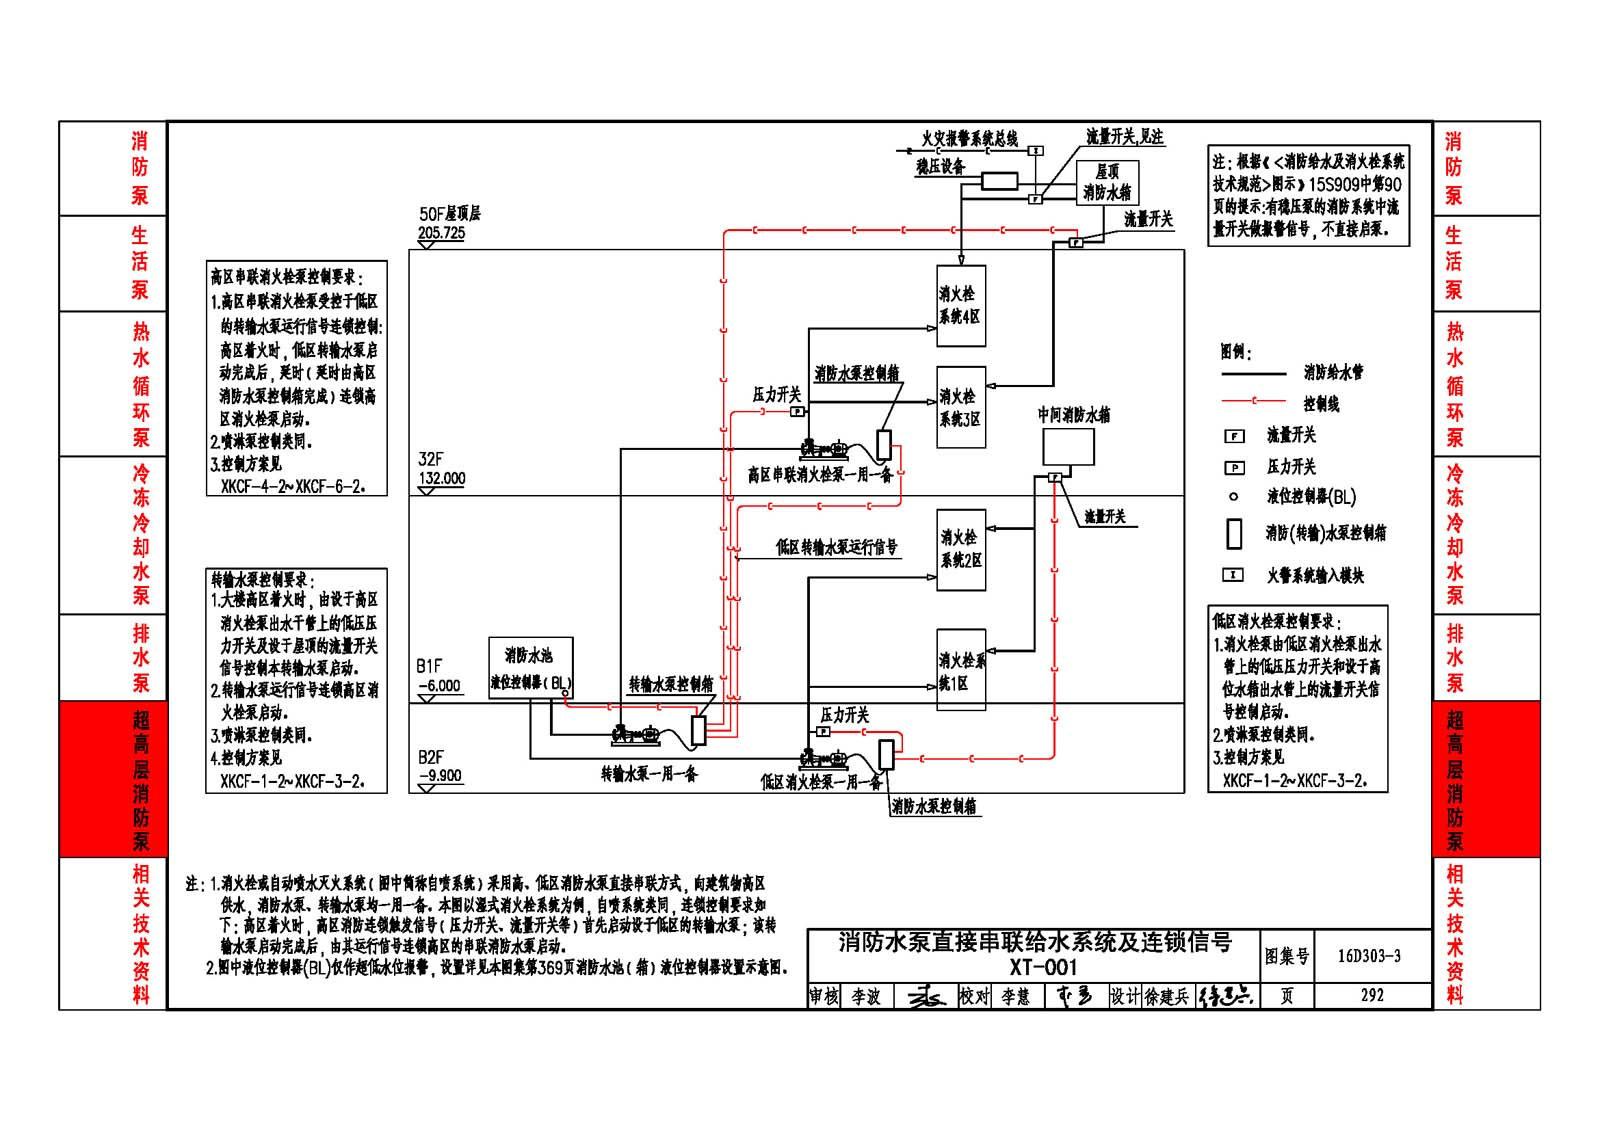 16d303-3《常用水泵控制电路图》图集页数选择指南